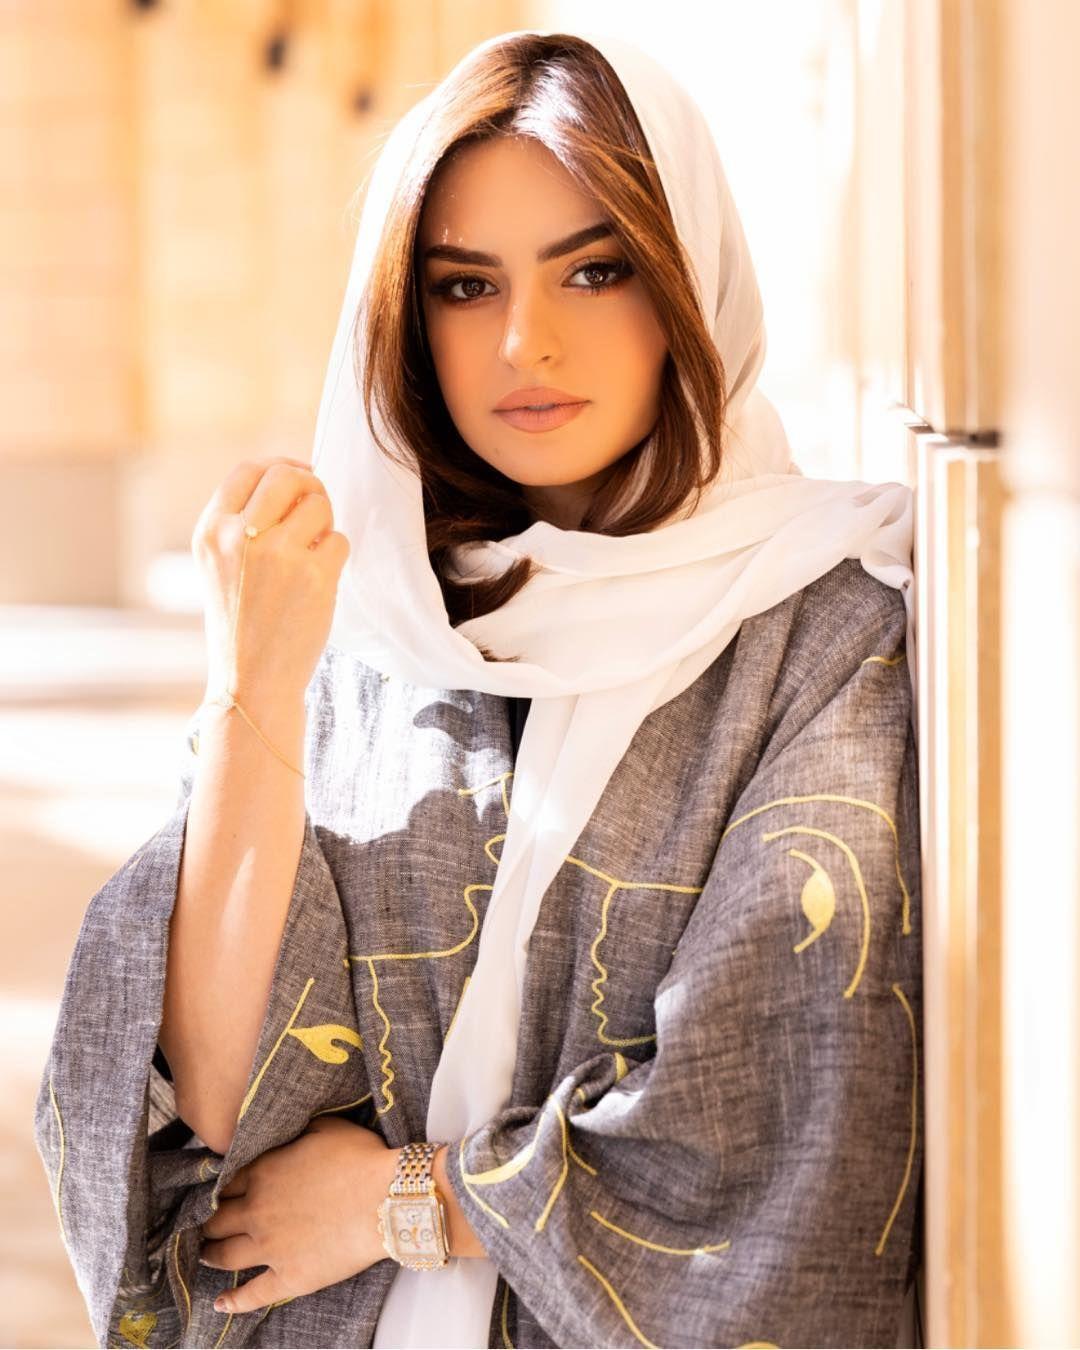 Safa Srour صفا سرور On Instagram Riyadh جمال و رقي مدينة الرياض شكرا على حسن الضيافة ماقصرتو را Beautiful Women Faces Cute Casual Outfits Women